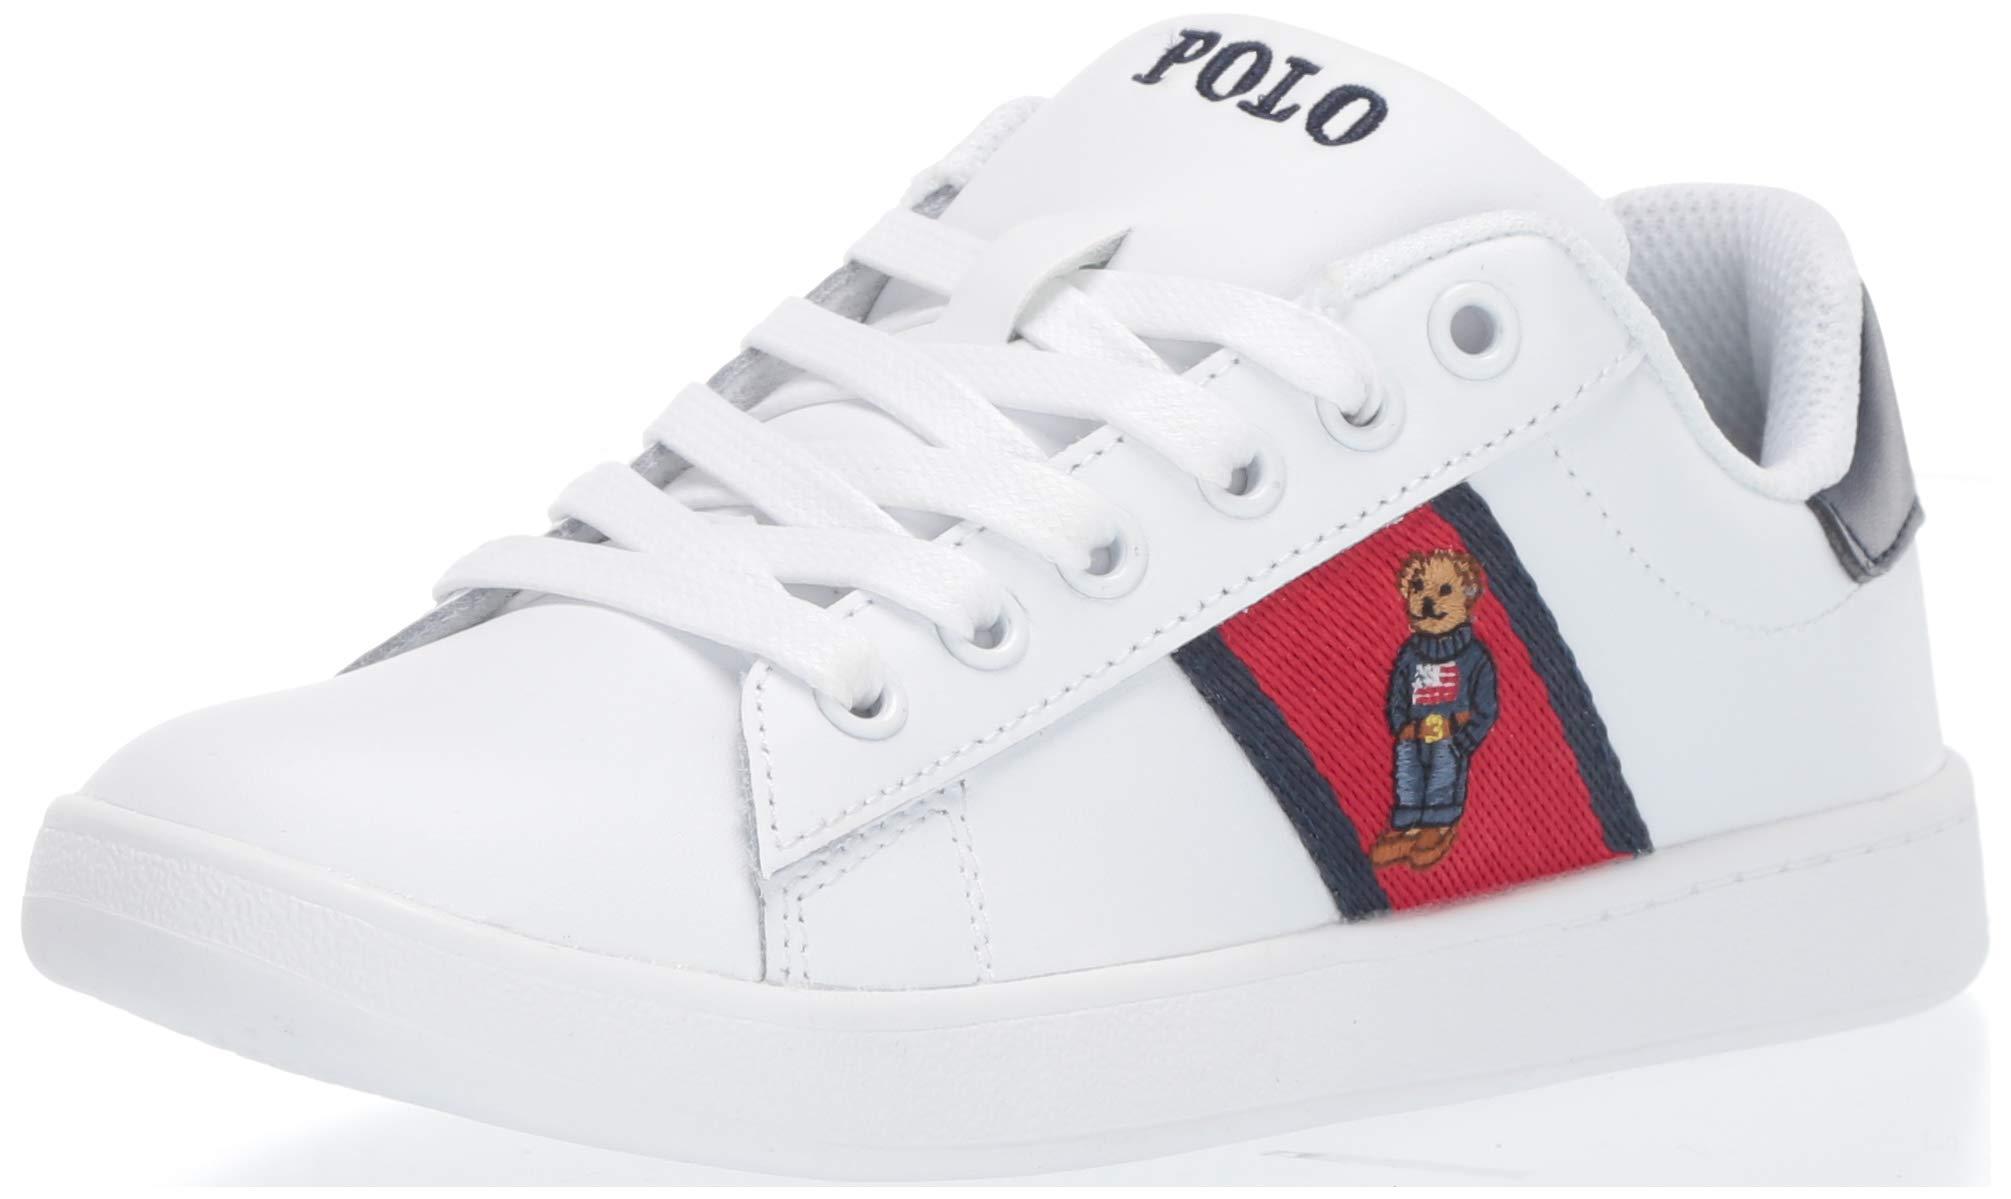 Polo Ralph Lauren 男女通用 Quilton Bear 儿童运动鞋